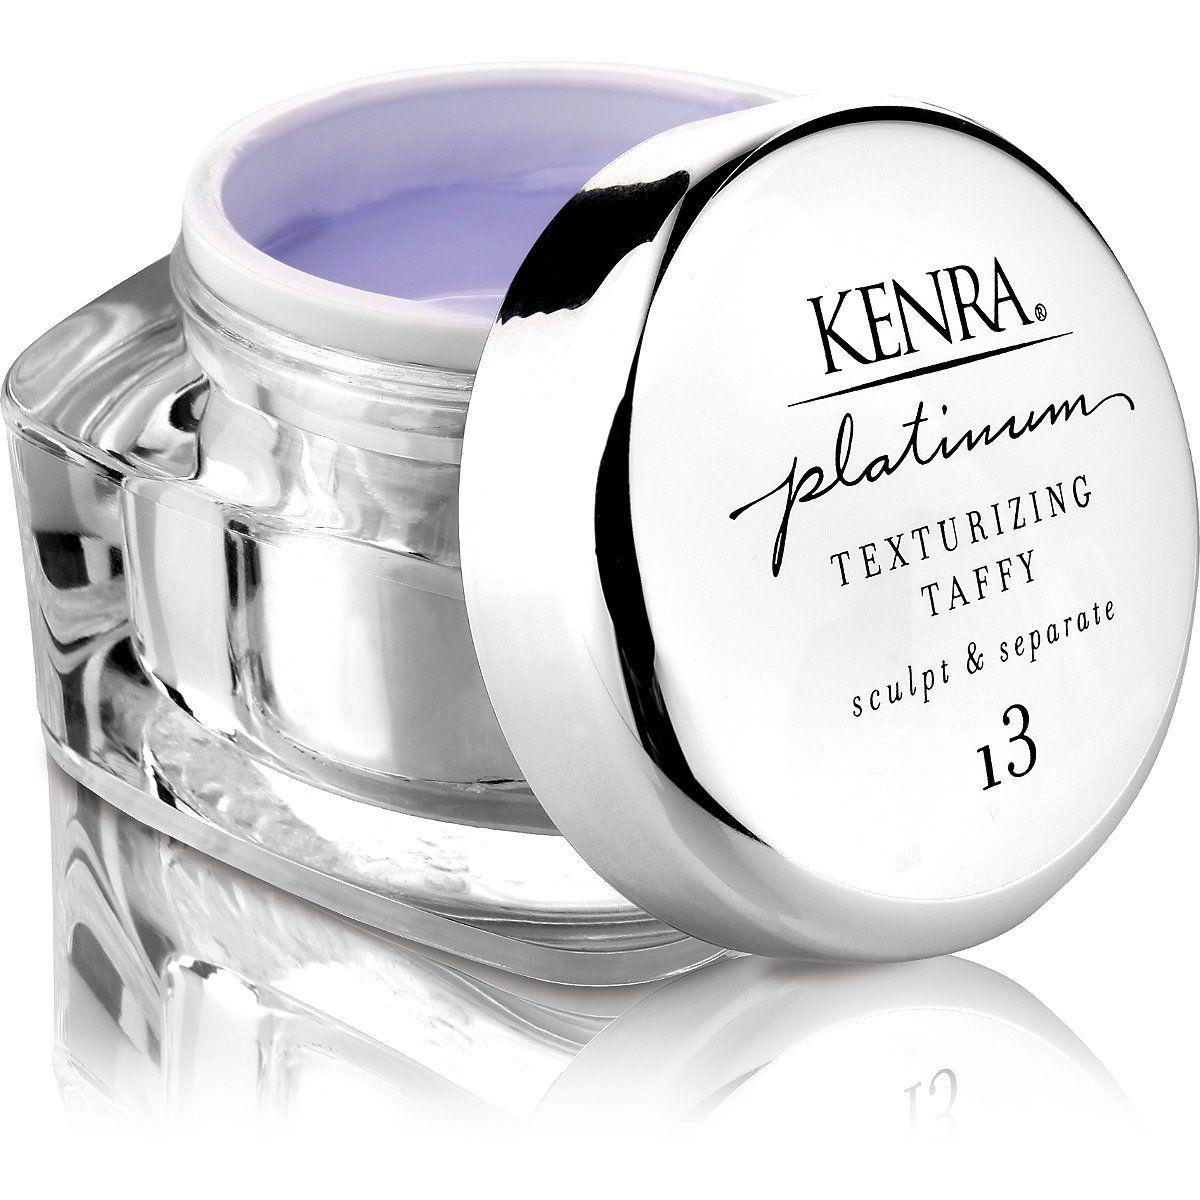 Kenra Professional Platinum Texturizing Taffy 13 | Ulta Beauty